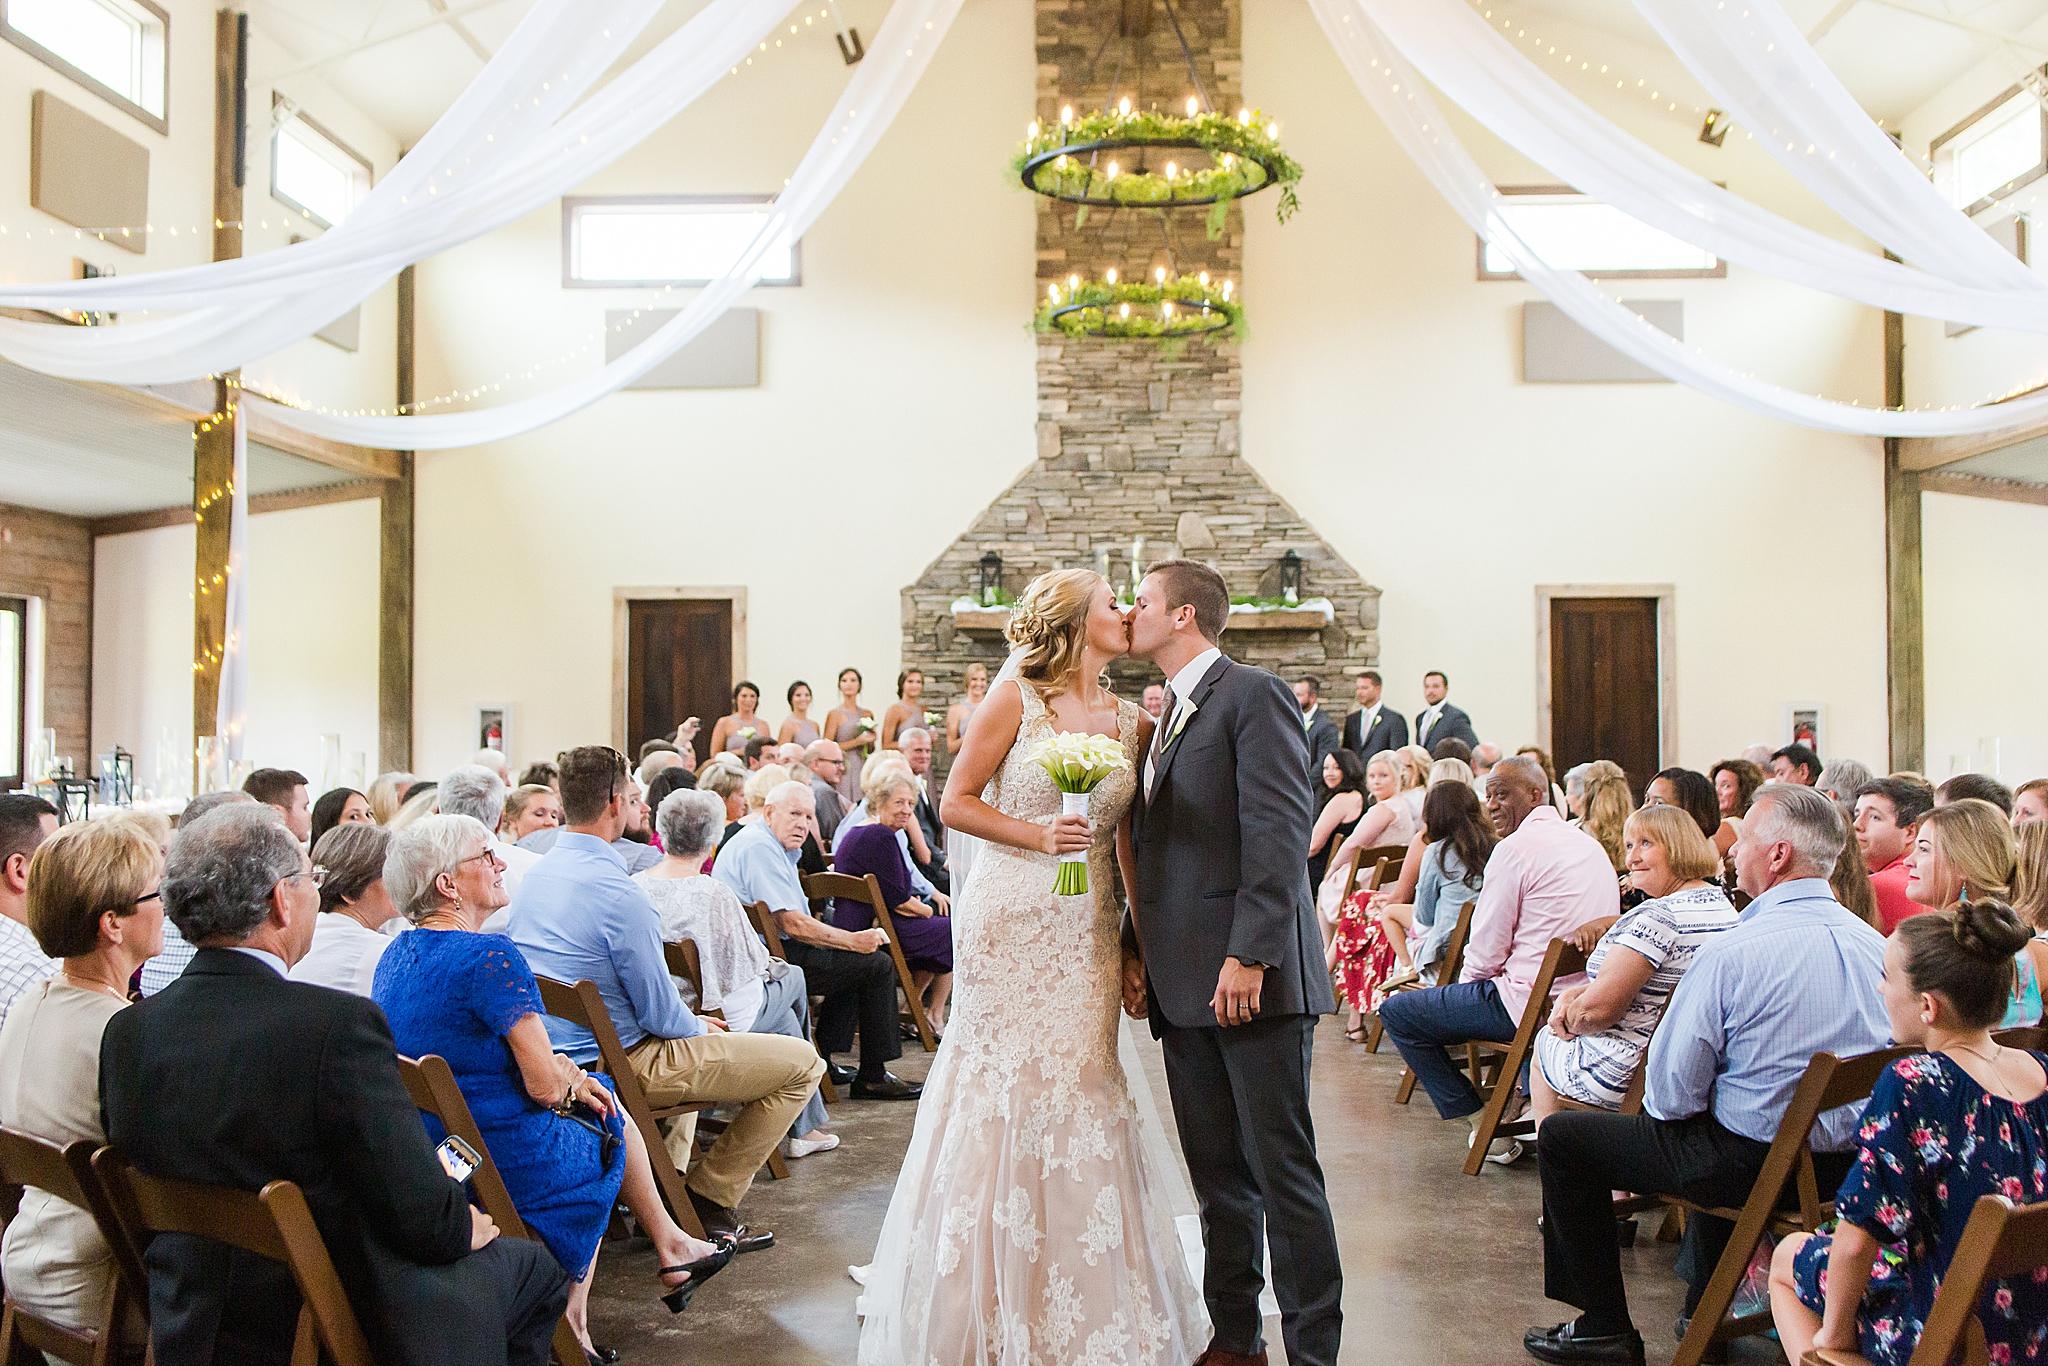 bride and groom leave wedding ceremony on Izenstone wedding day